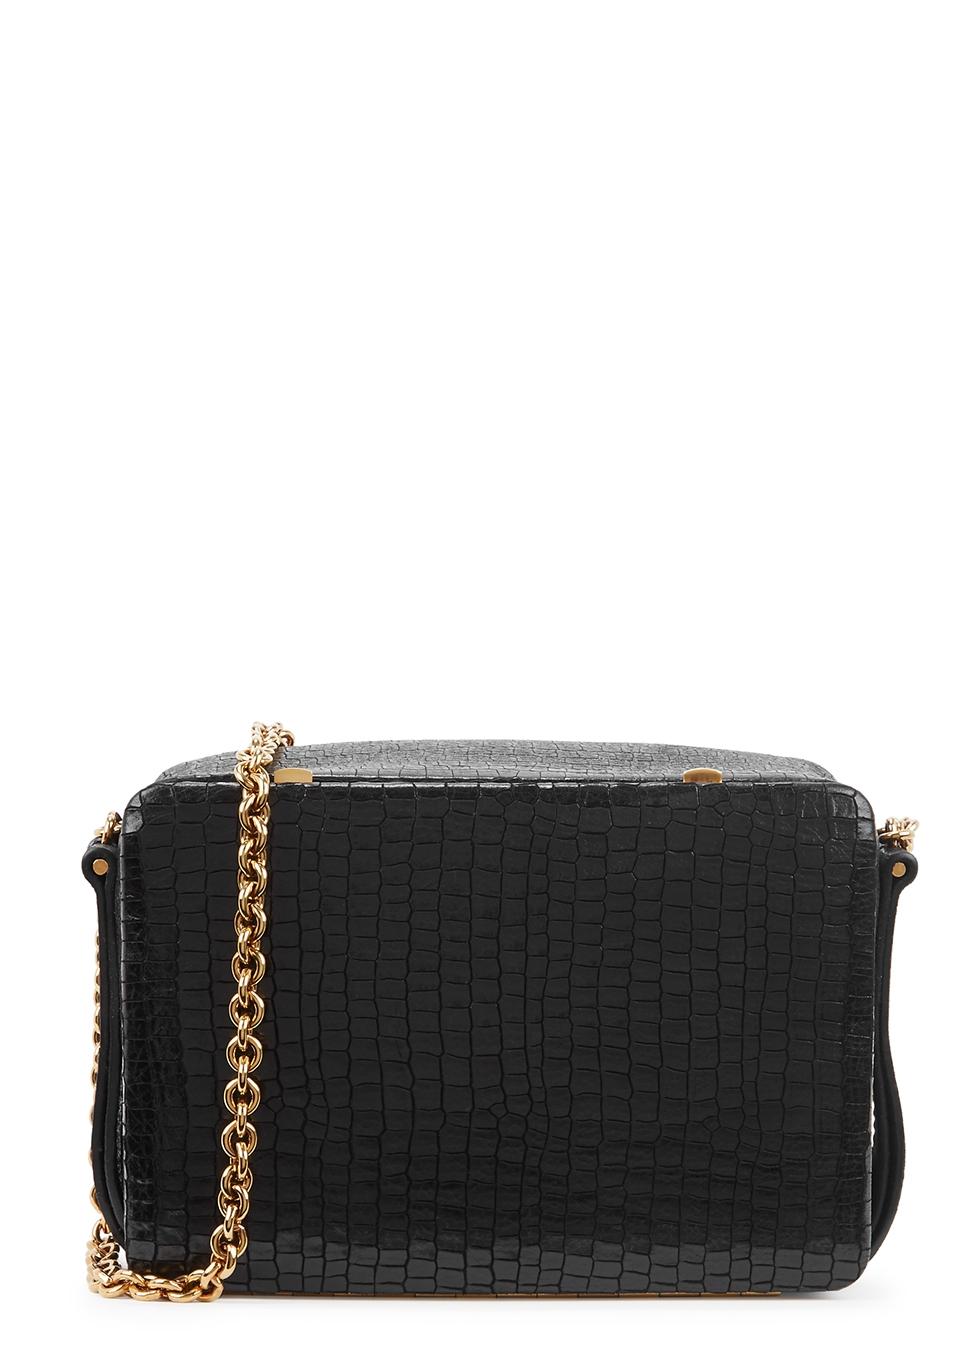 Morrow mini black leather shoulder bag - Lutz Morris